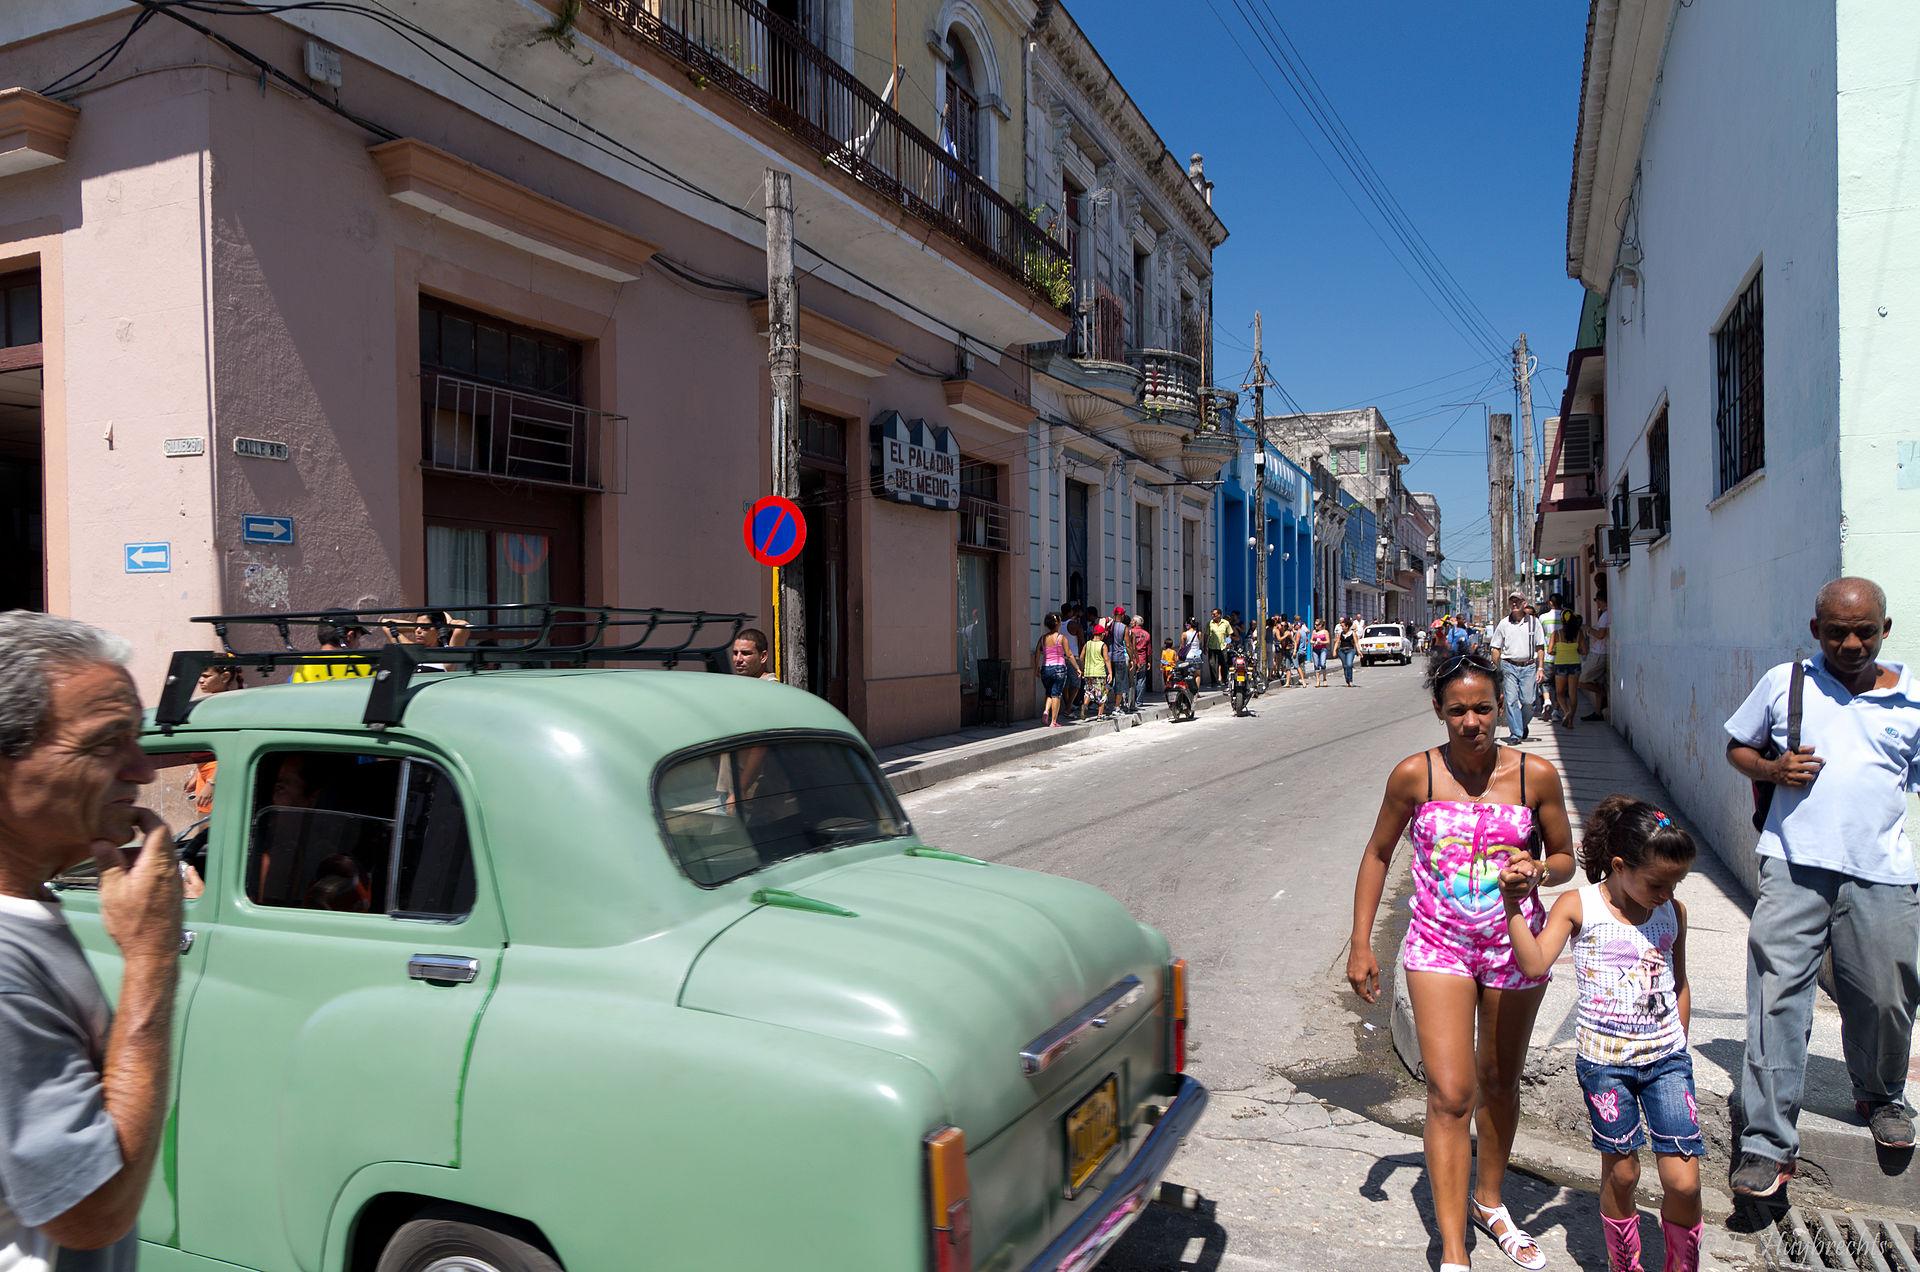 Scenes_of_Cuba_(K5_02551)_(5978552313)